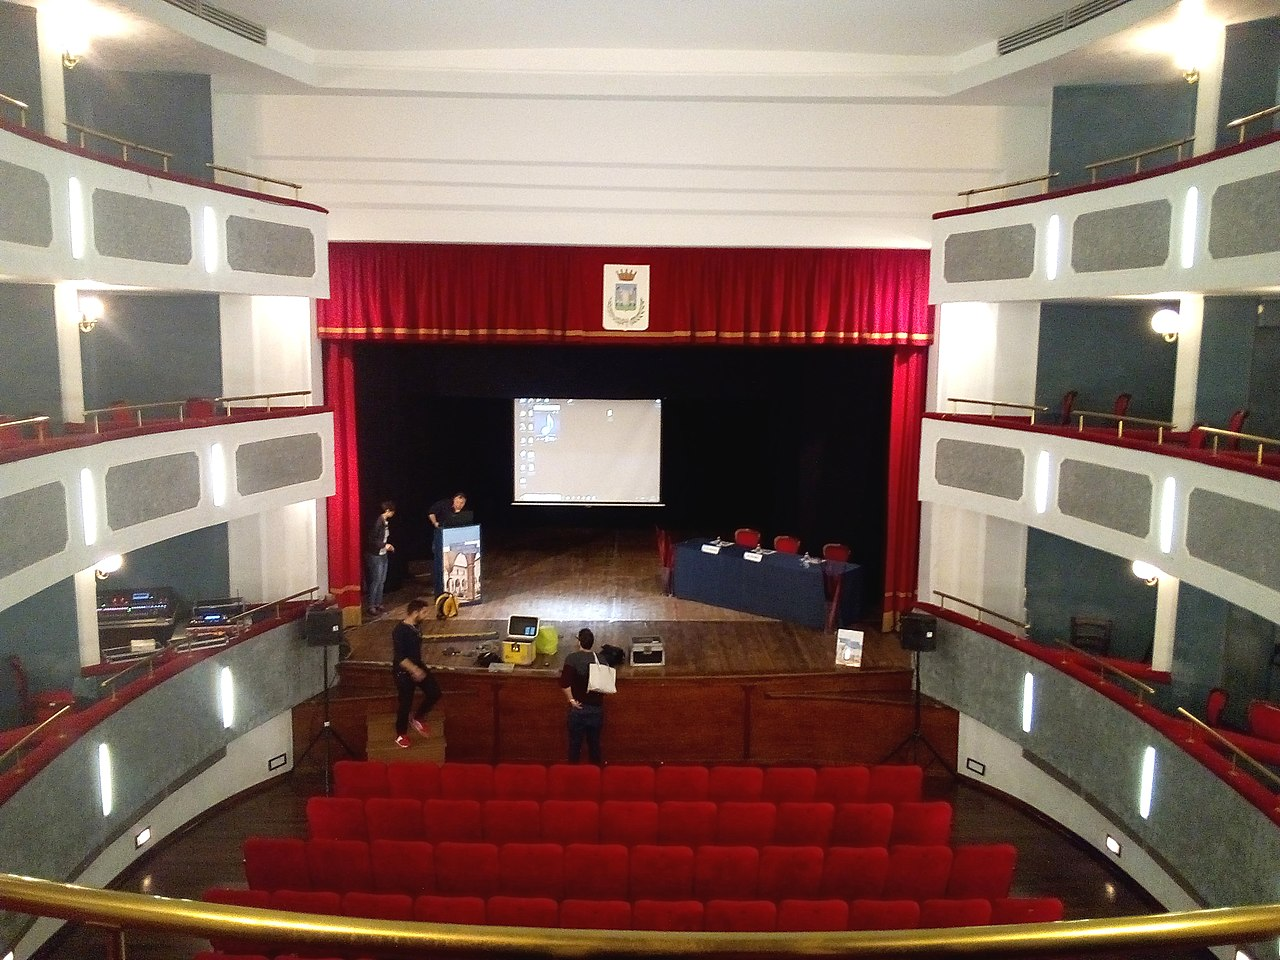 Teatro Talia Tagliacozzo interno.jpg